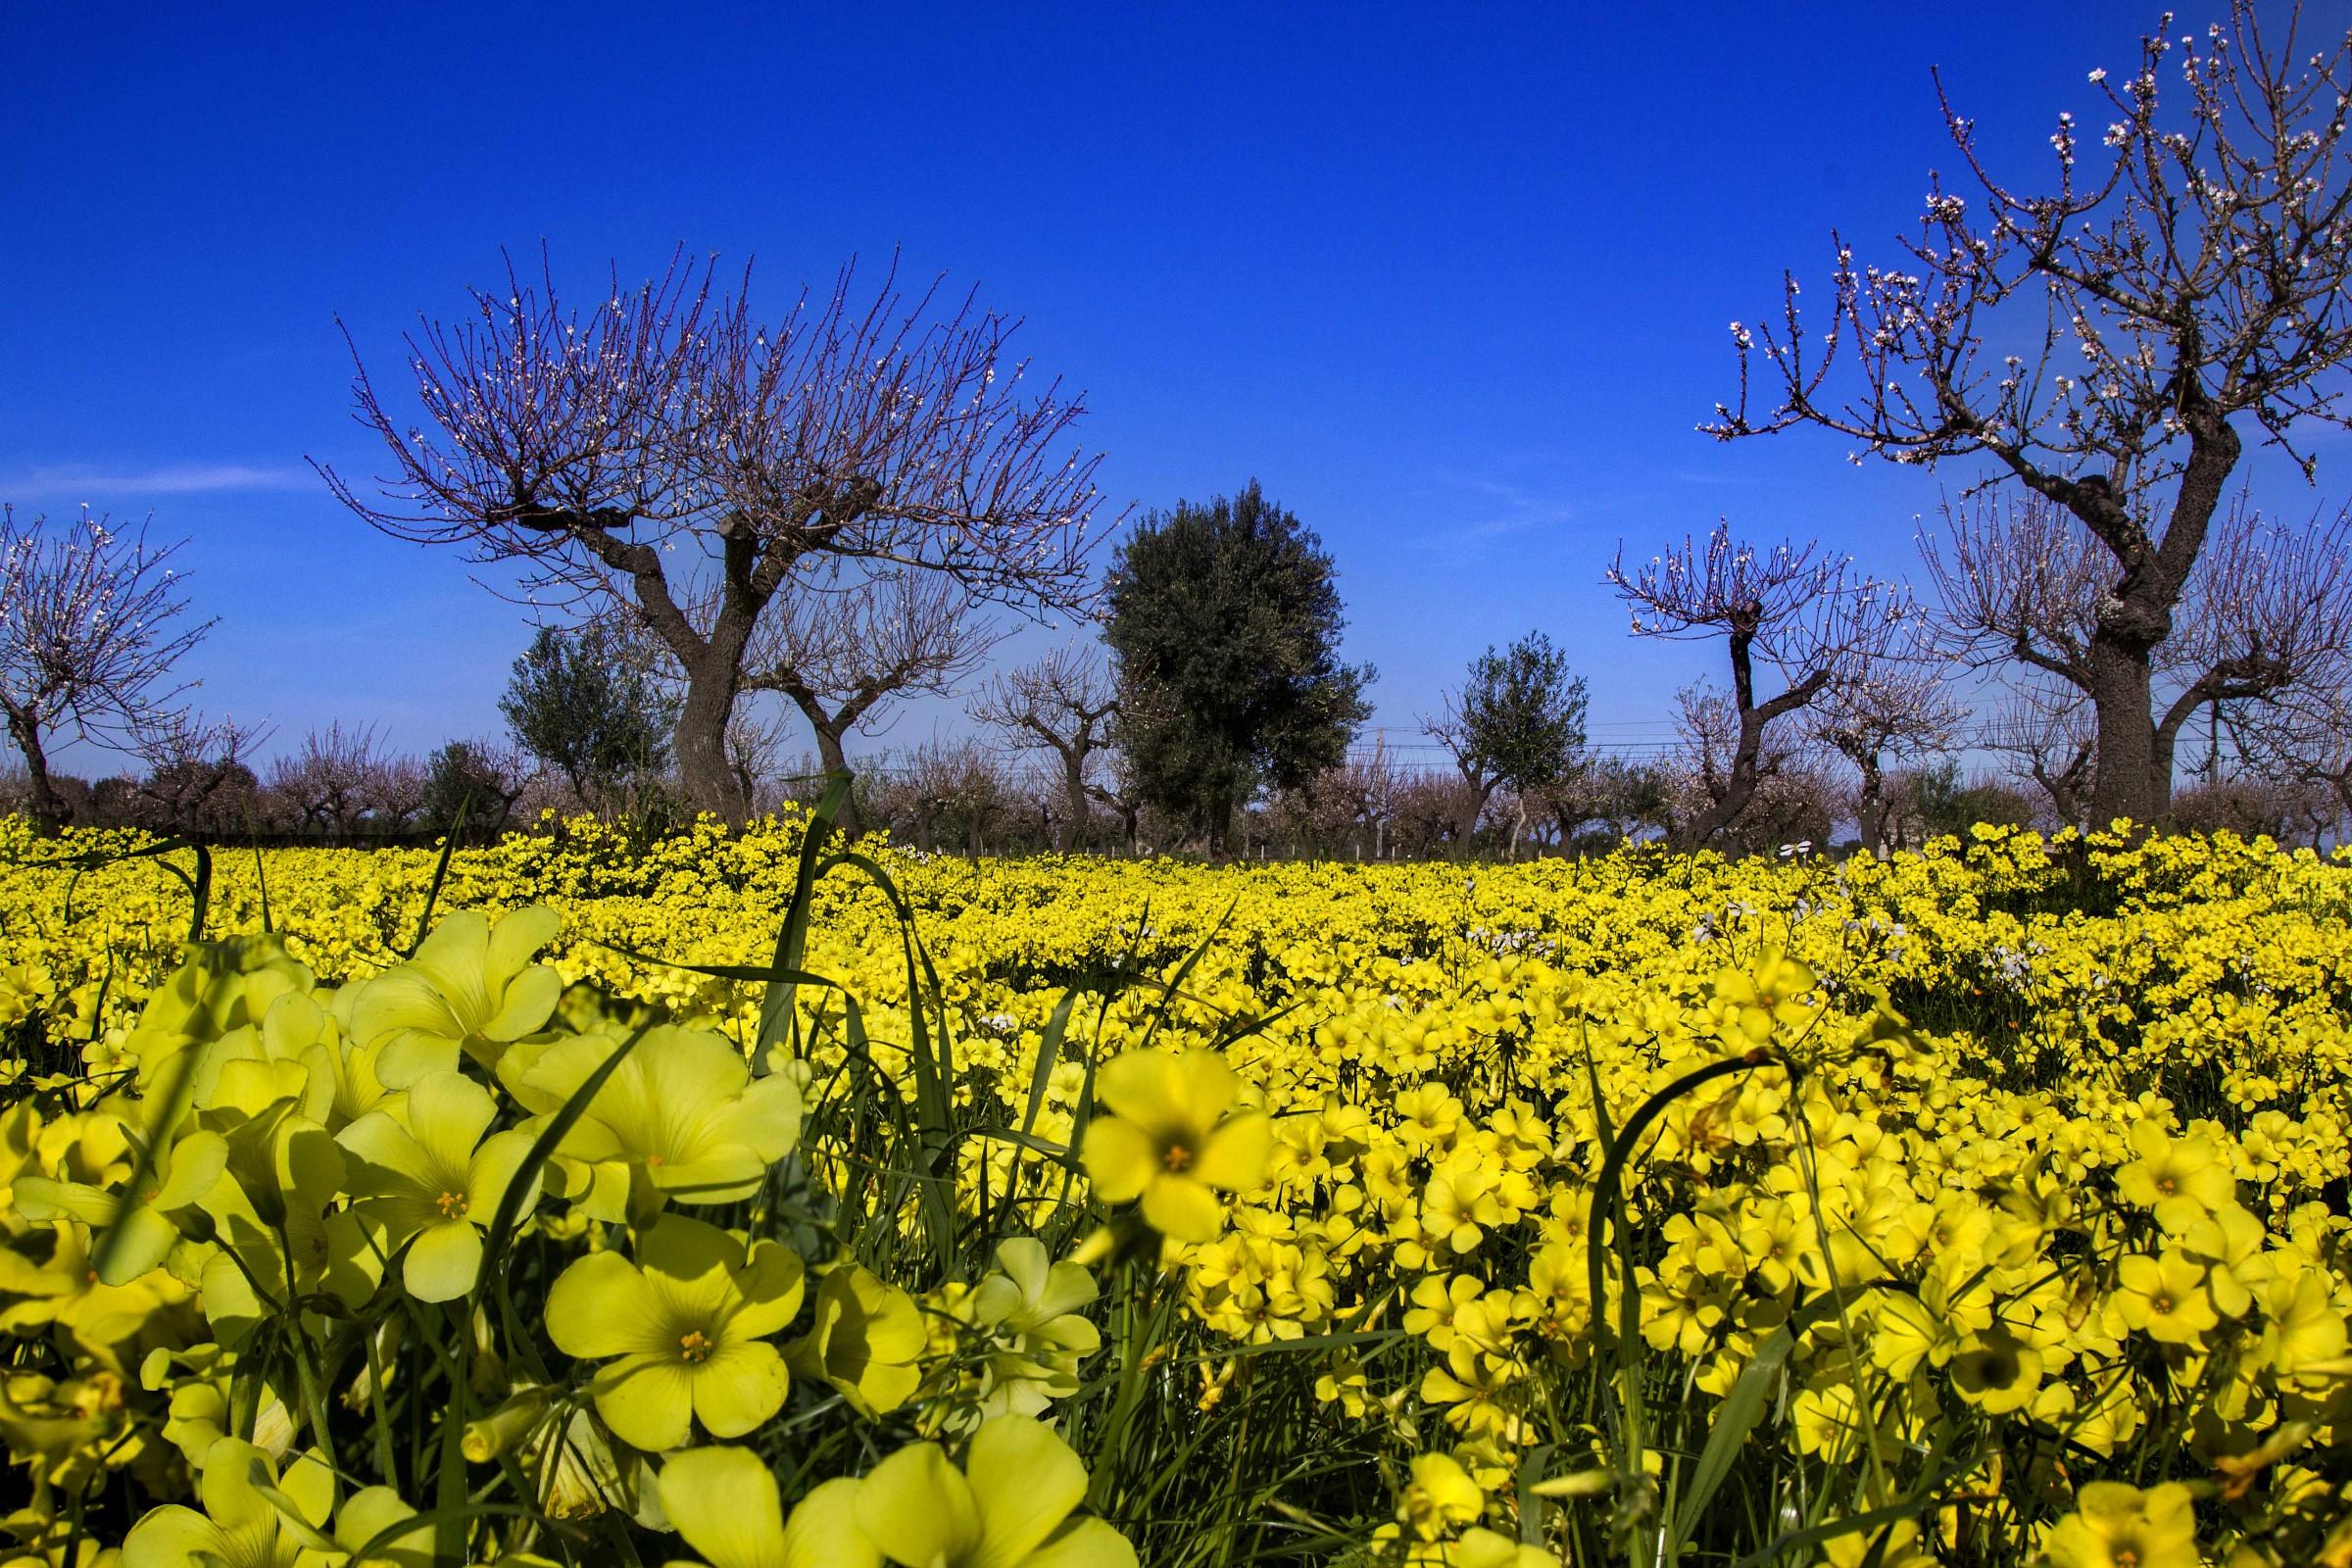 Flowers yellow wood sorrel (Oxalis pes-caprae)...